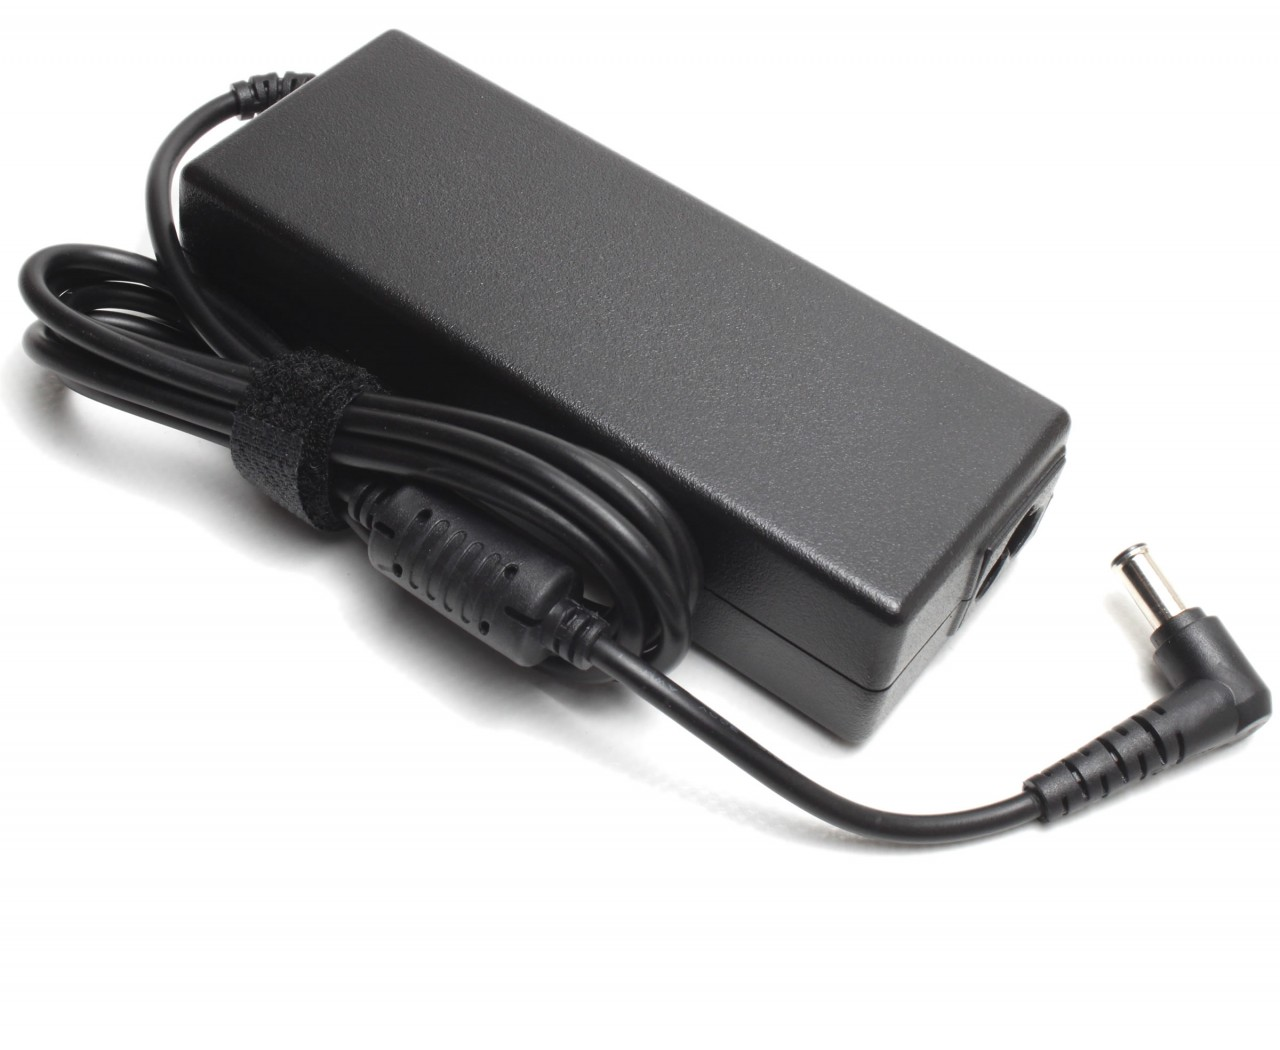 Incarcator Sony Vaio VGN NW20 Replacement imagine powerlaptop.ro 2021